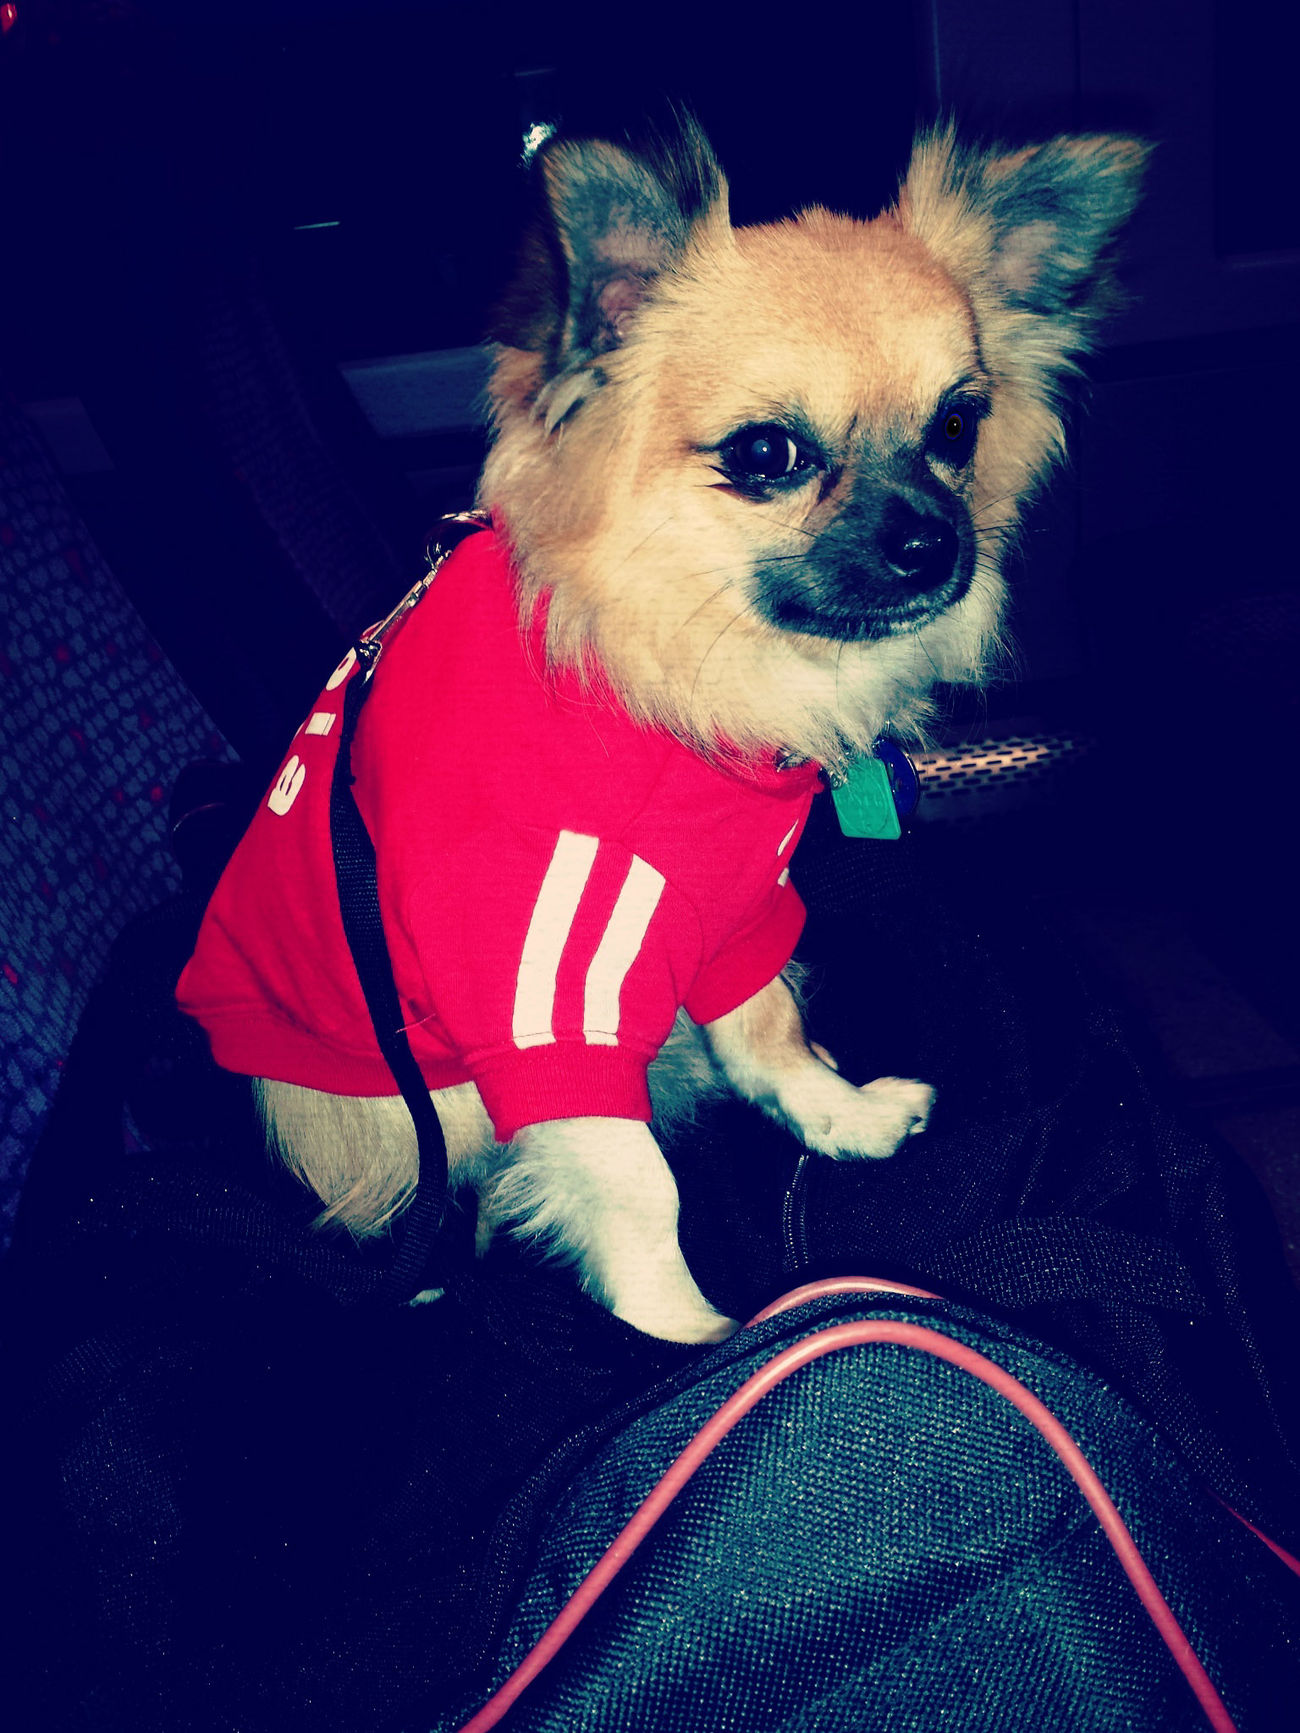 cool puppy in his huddy Cool Dude Puppy In A Hoody Rockingit Badboy